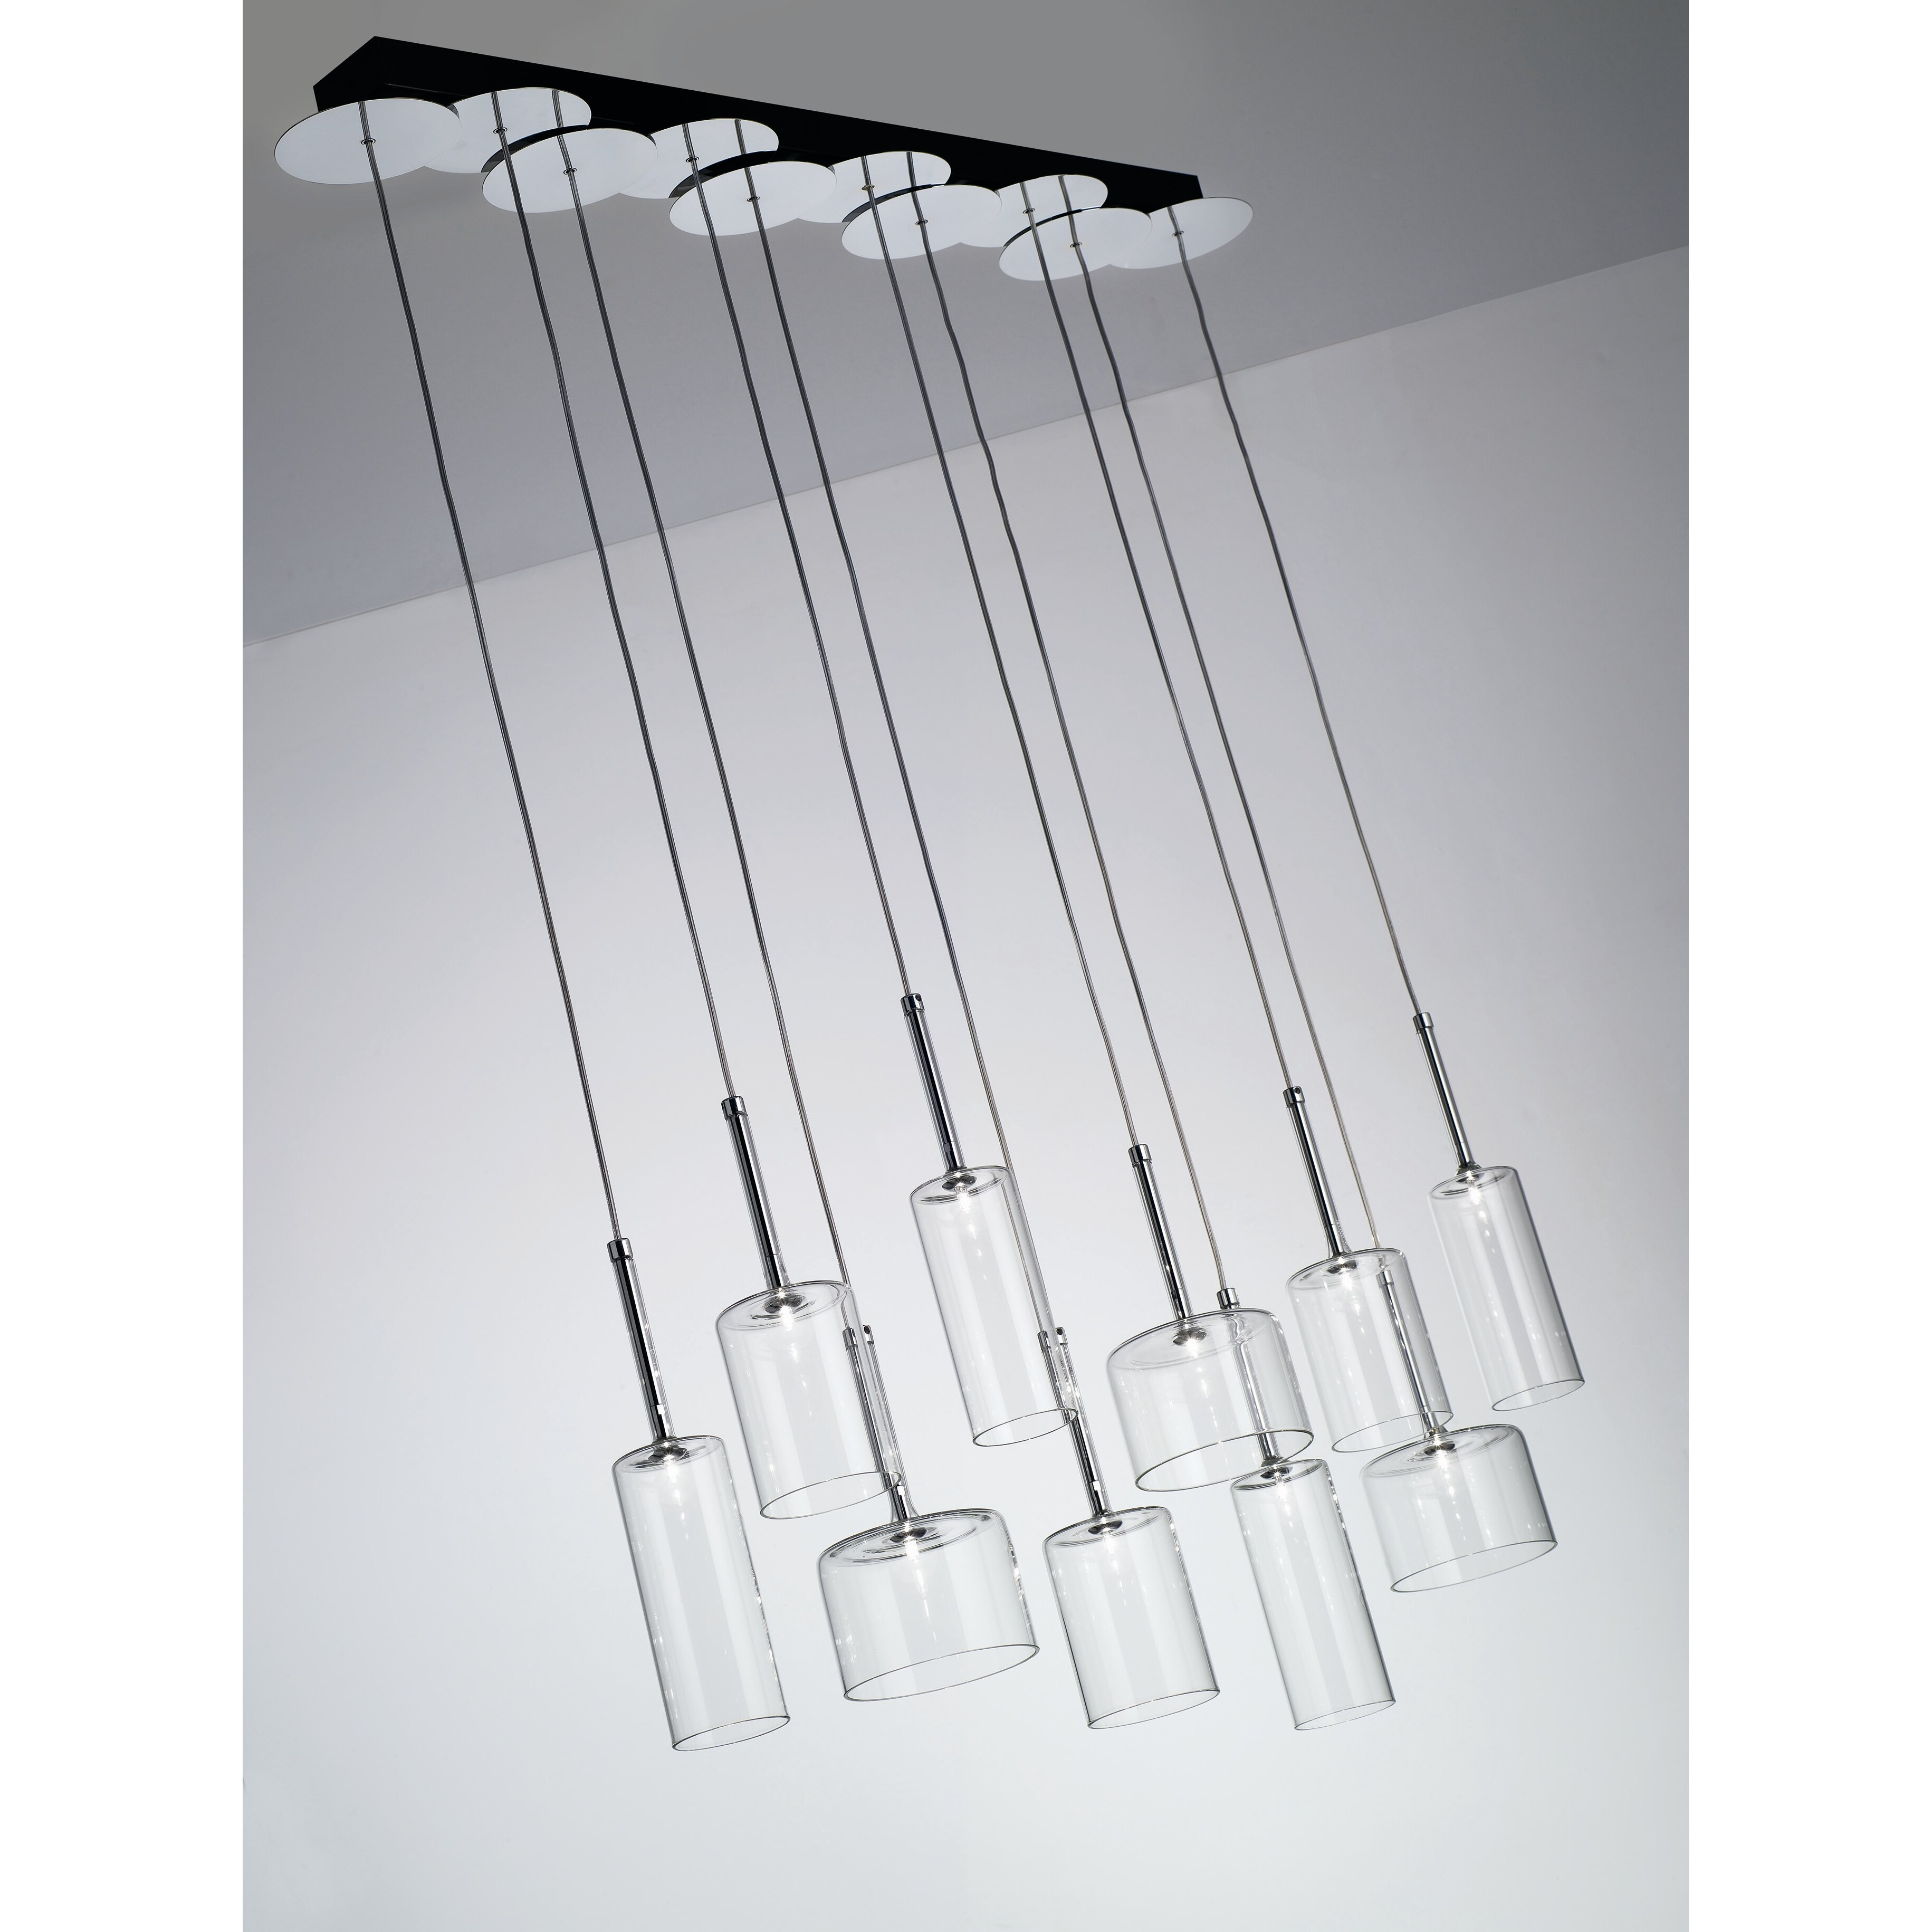 axo light spillray 10 light chandelier reviews wayfair. Black Bedroom Furniture Sets. Home Design Ideas